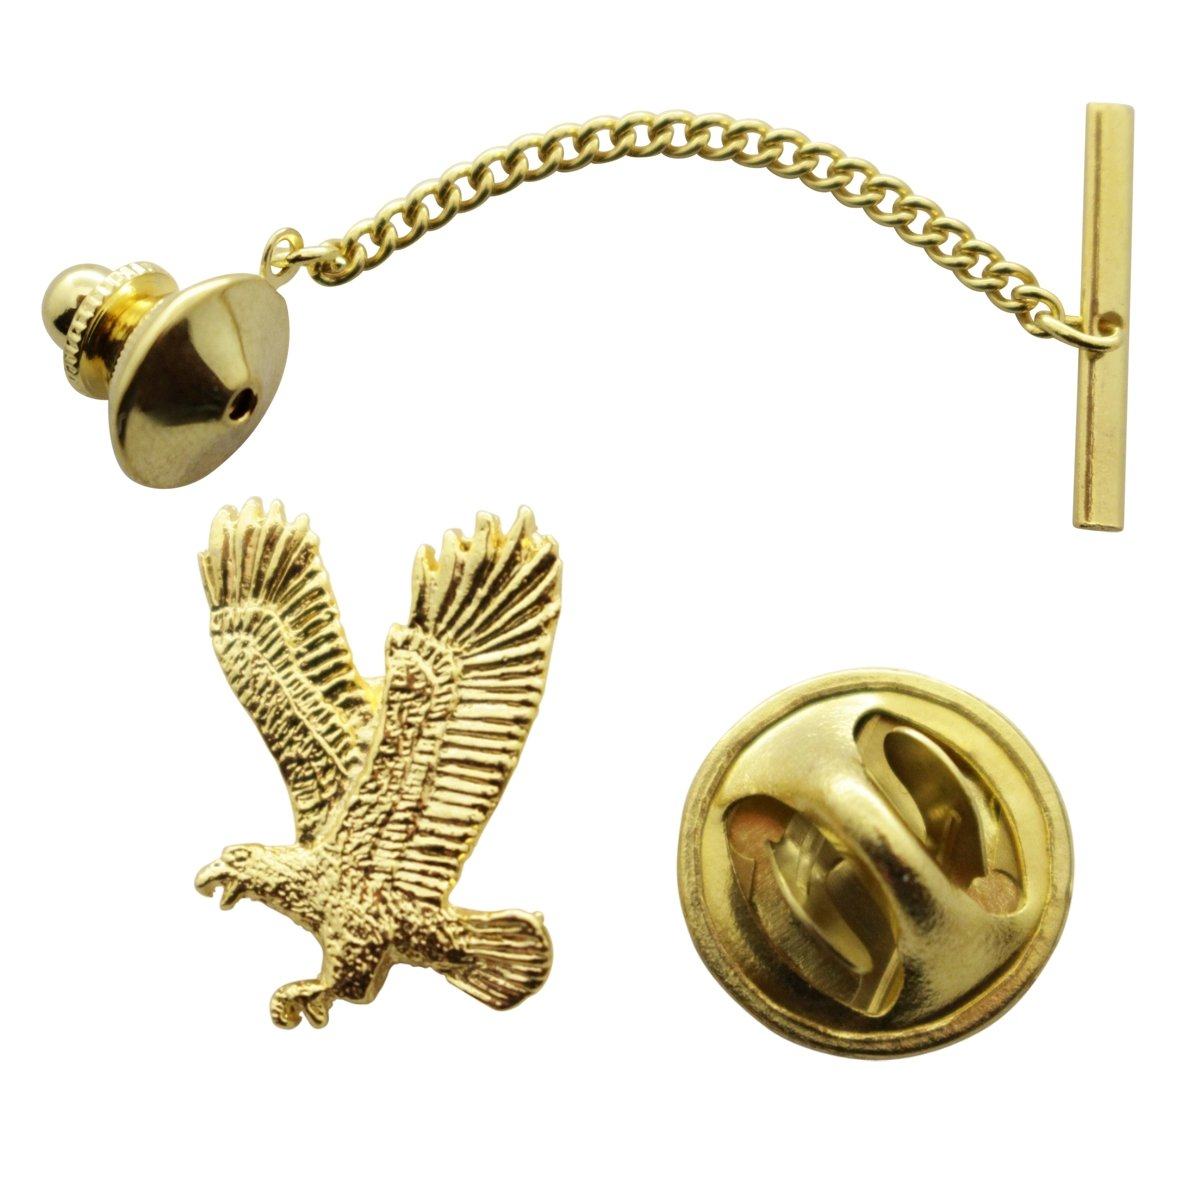 Flying Eagle Tie Tack ~ 24K Gold ~ Tie Tack or Pin ~ Sarah's Treats & Treasures